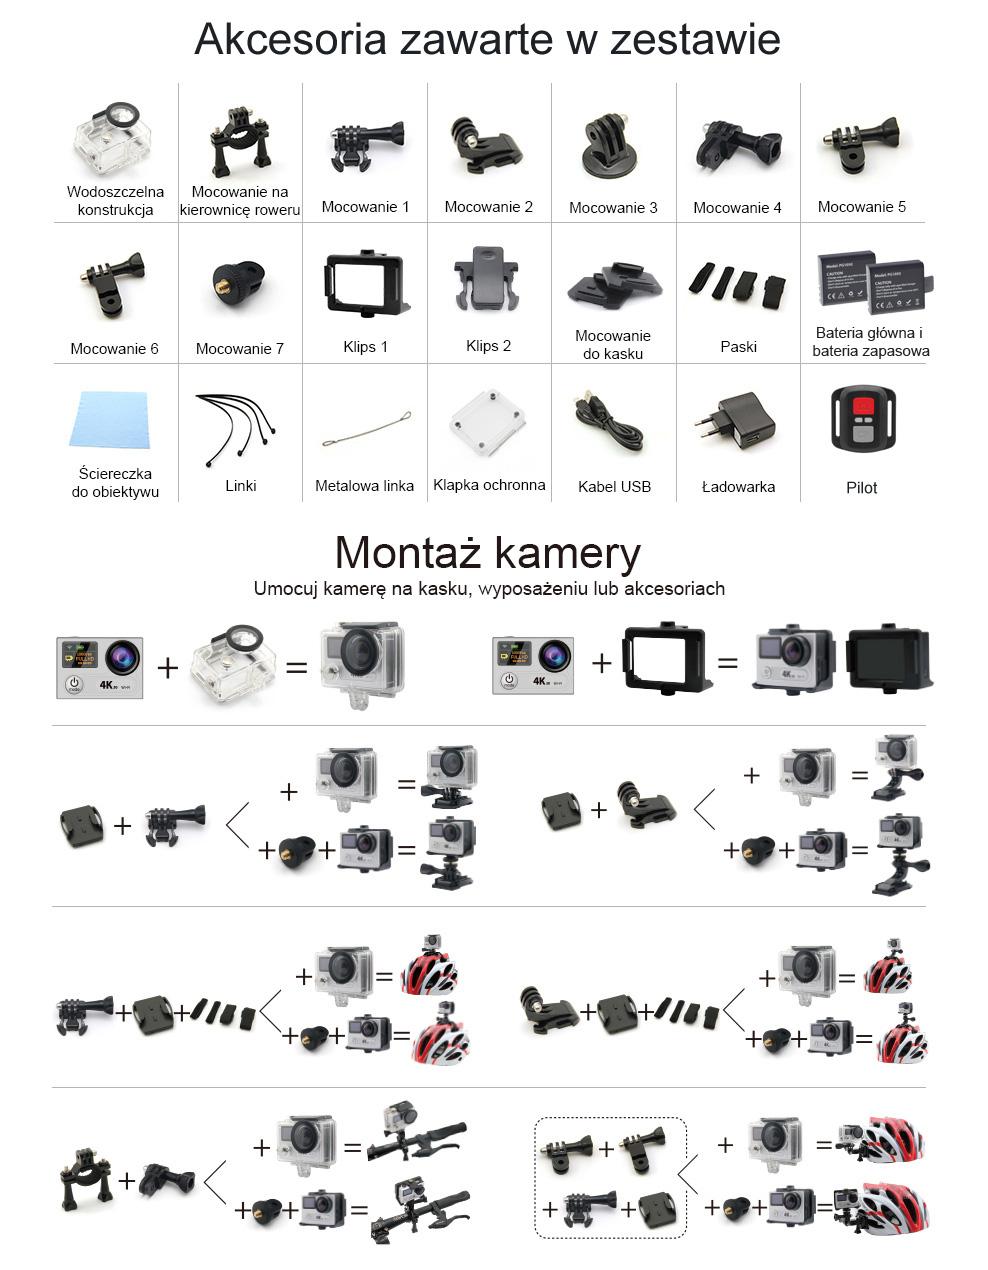 H8R_accesories.jpg